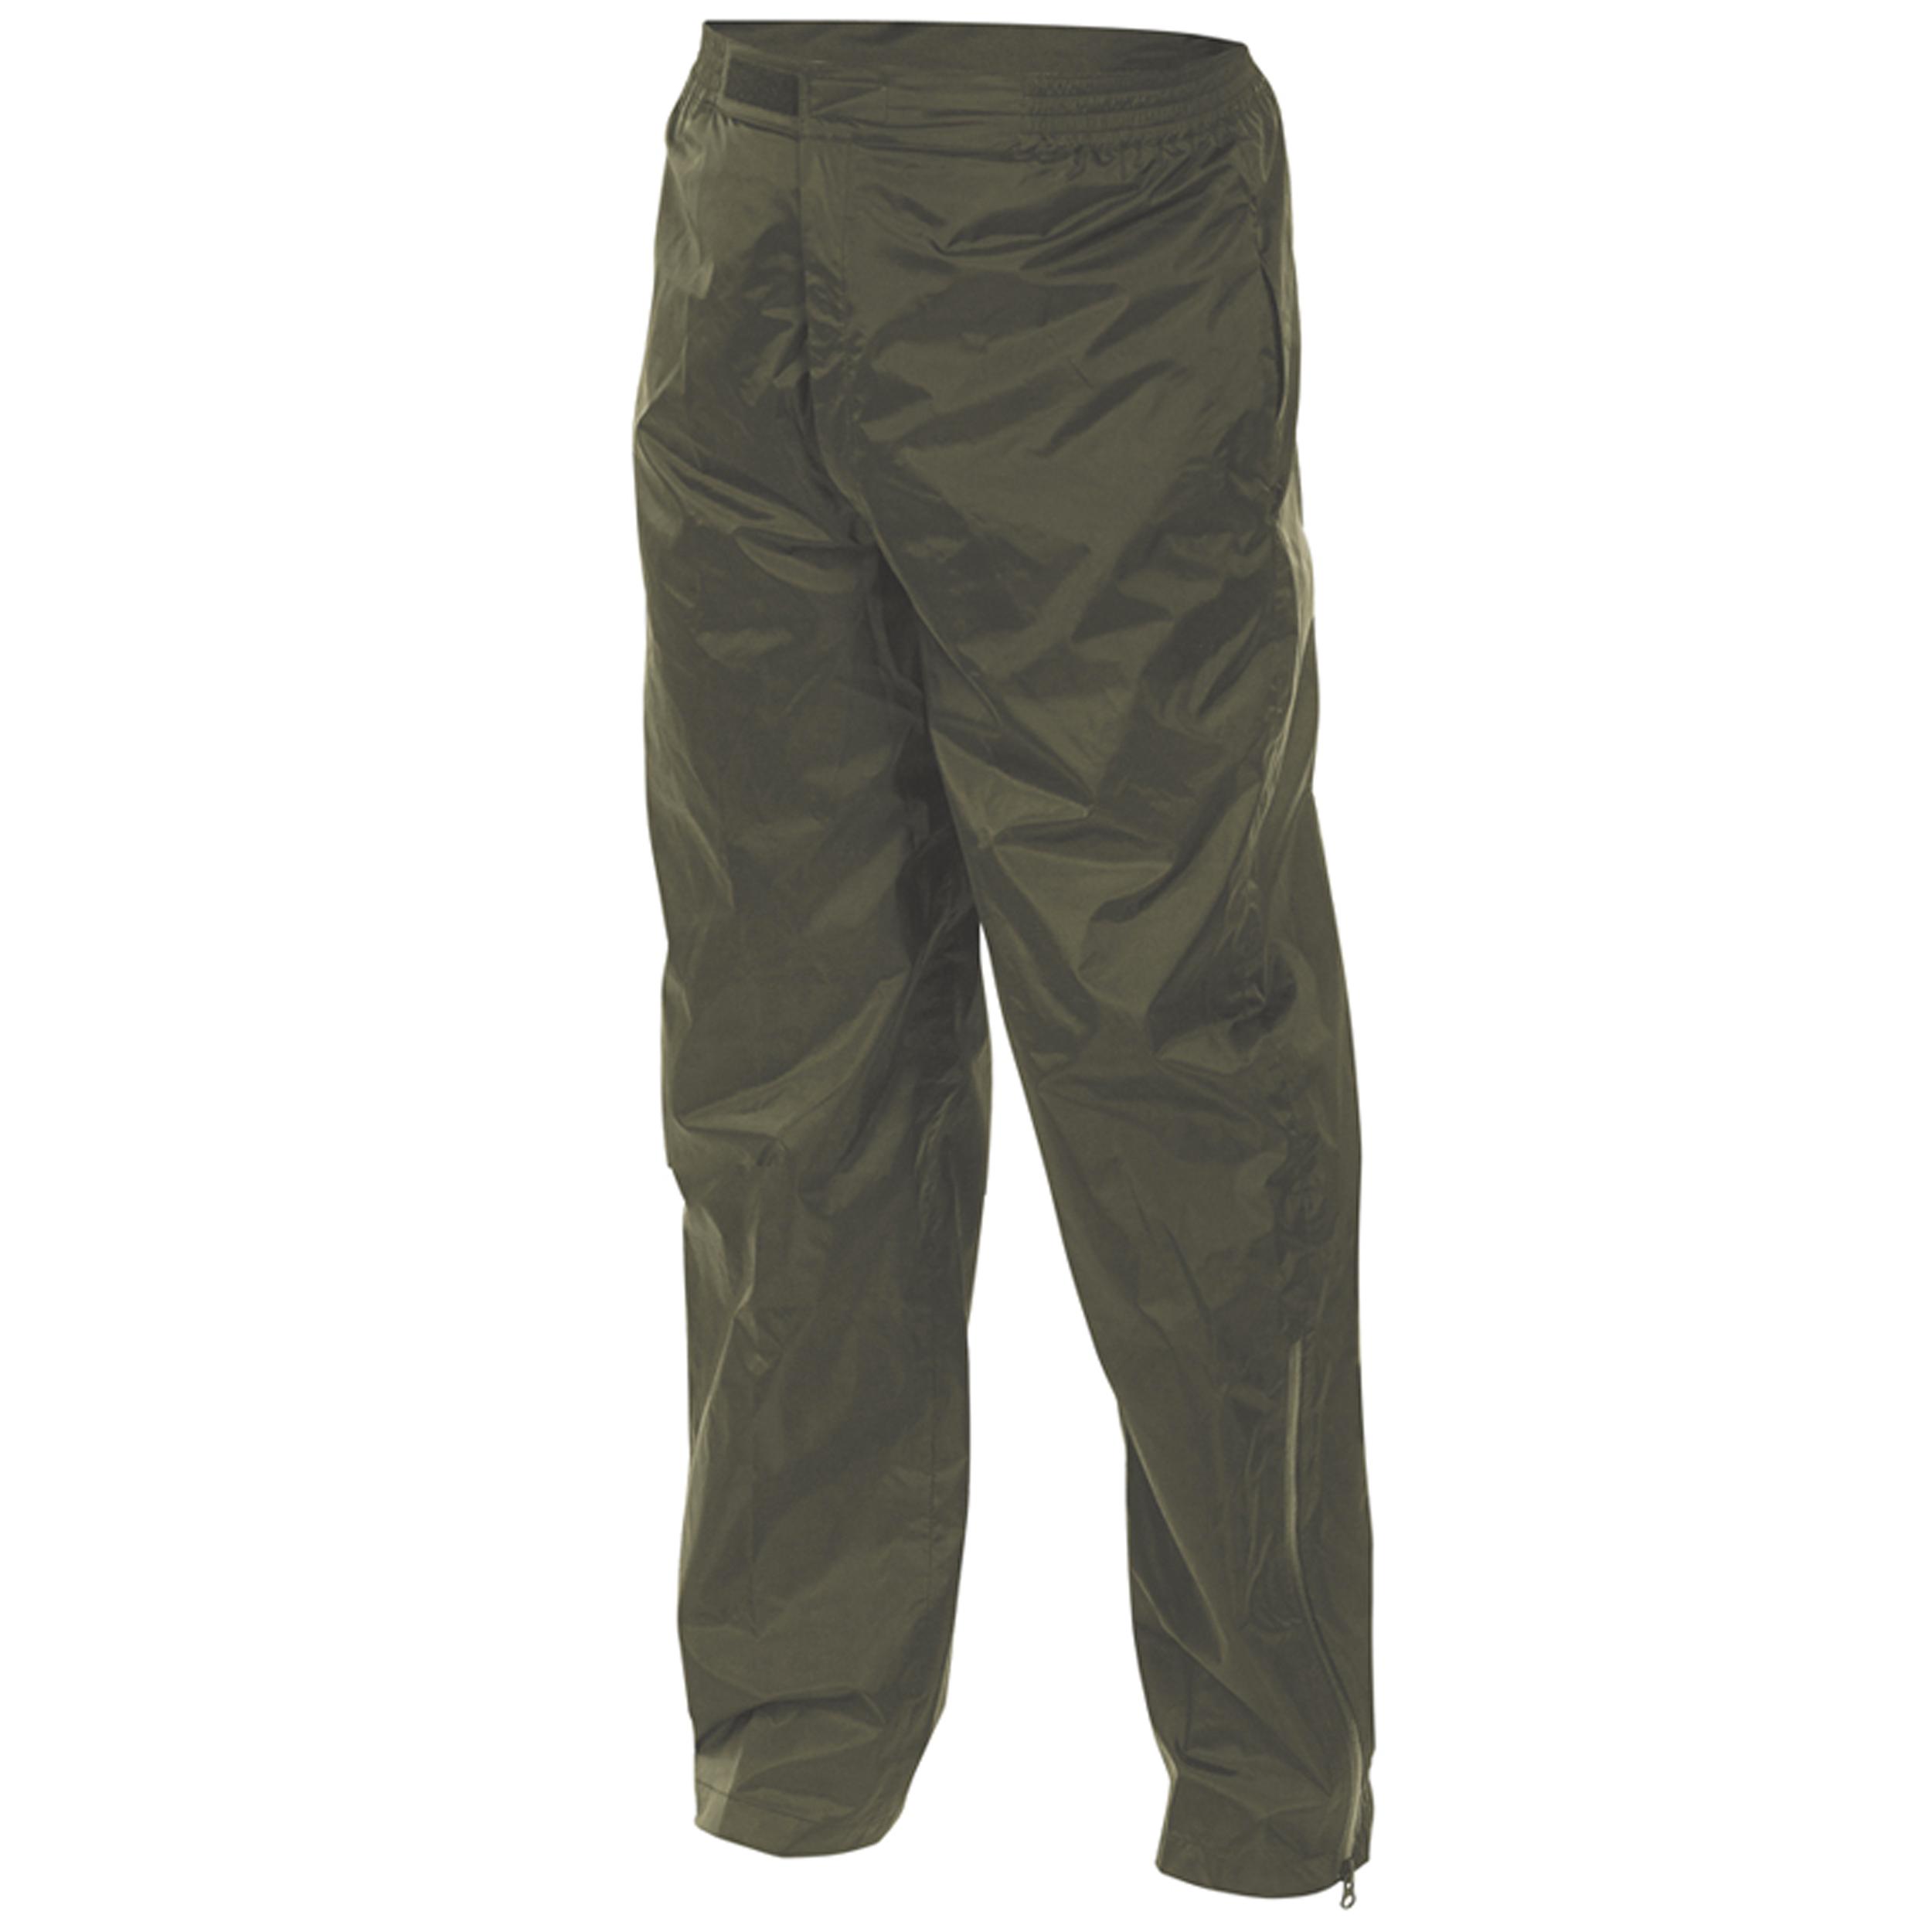 Snugpak Rp1 Rain Pants Olive Xxl